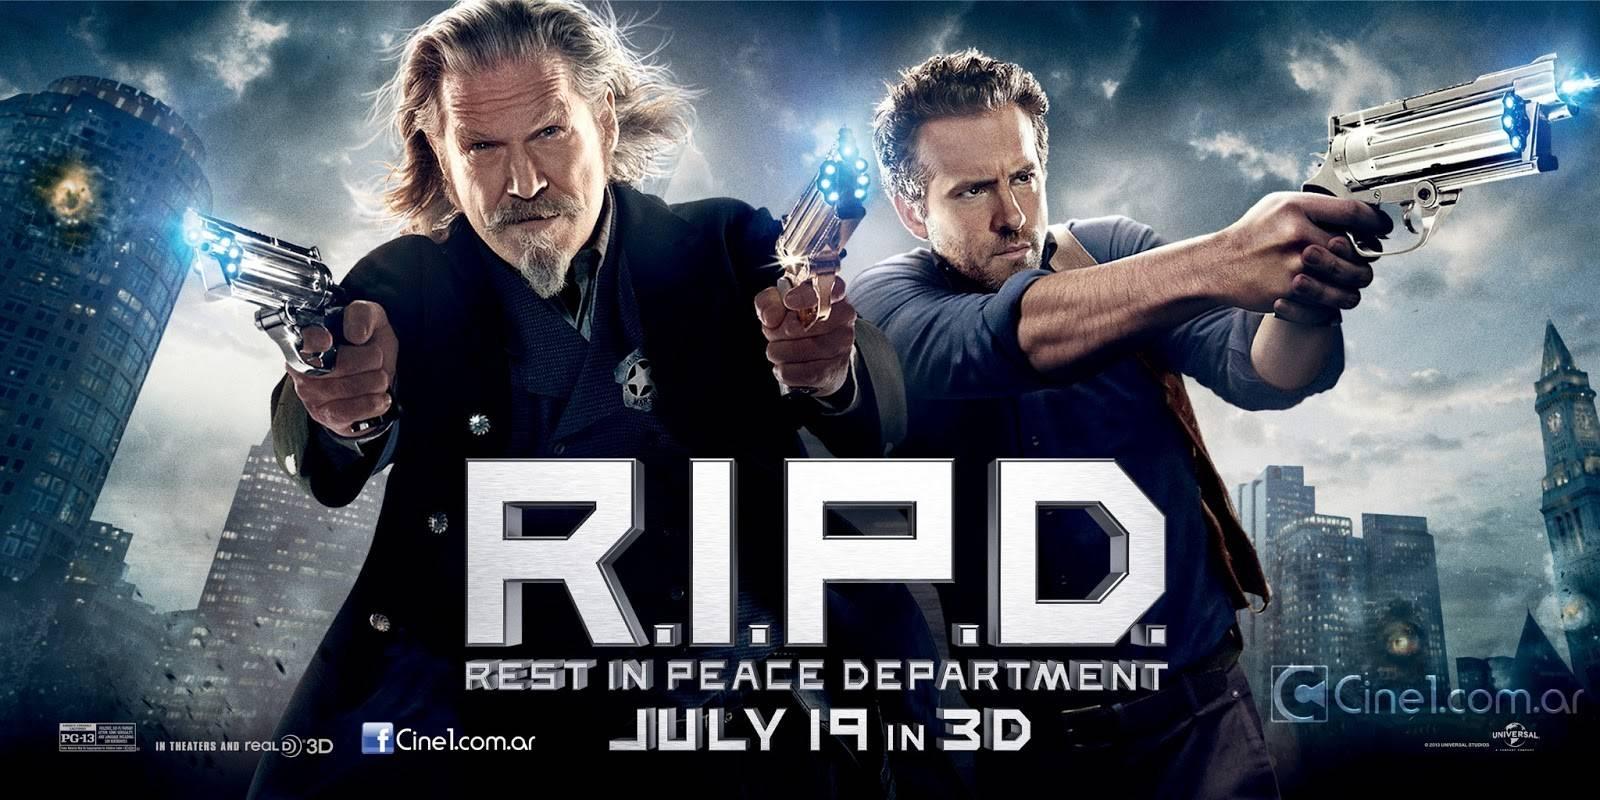 R.I.P.D. Banners Jeff Bridges, Ryan Reynolds